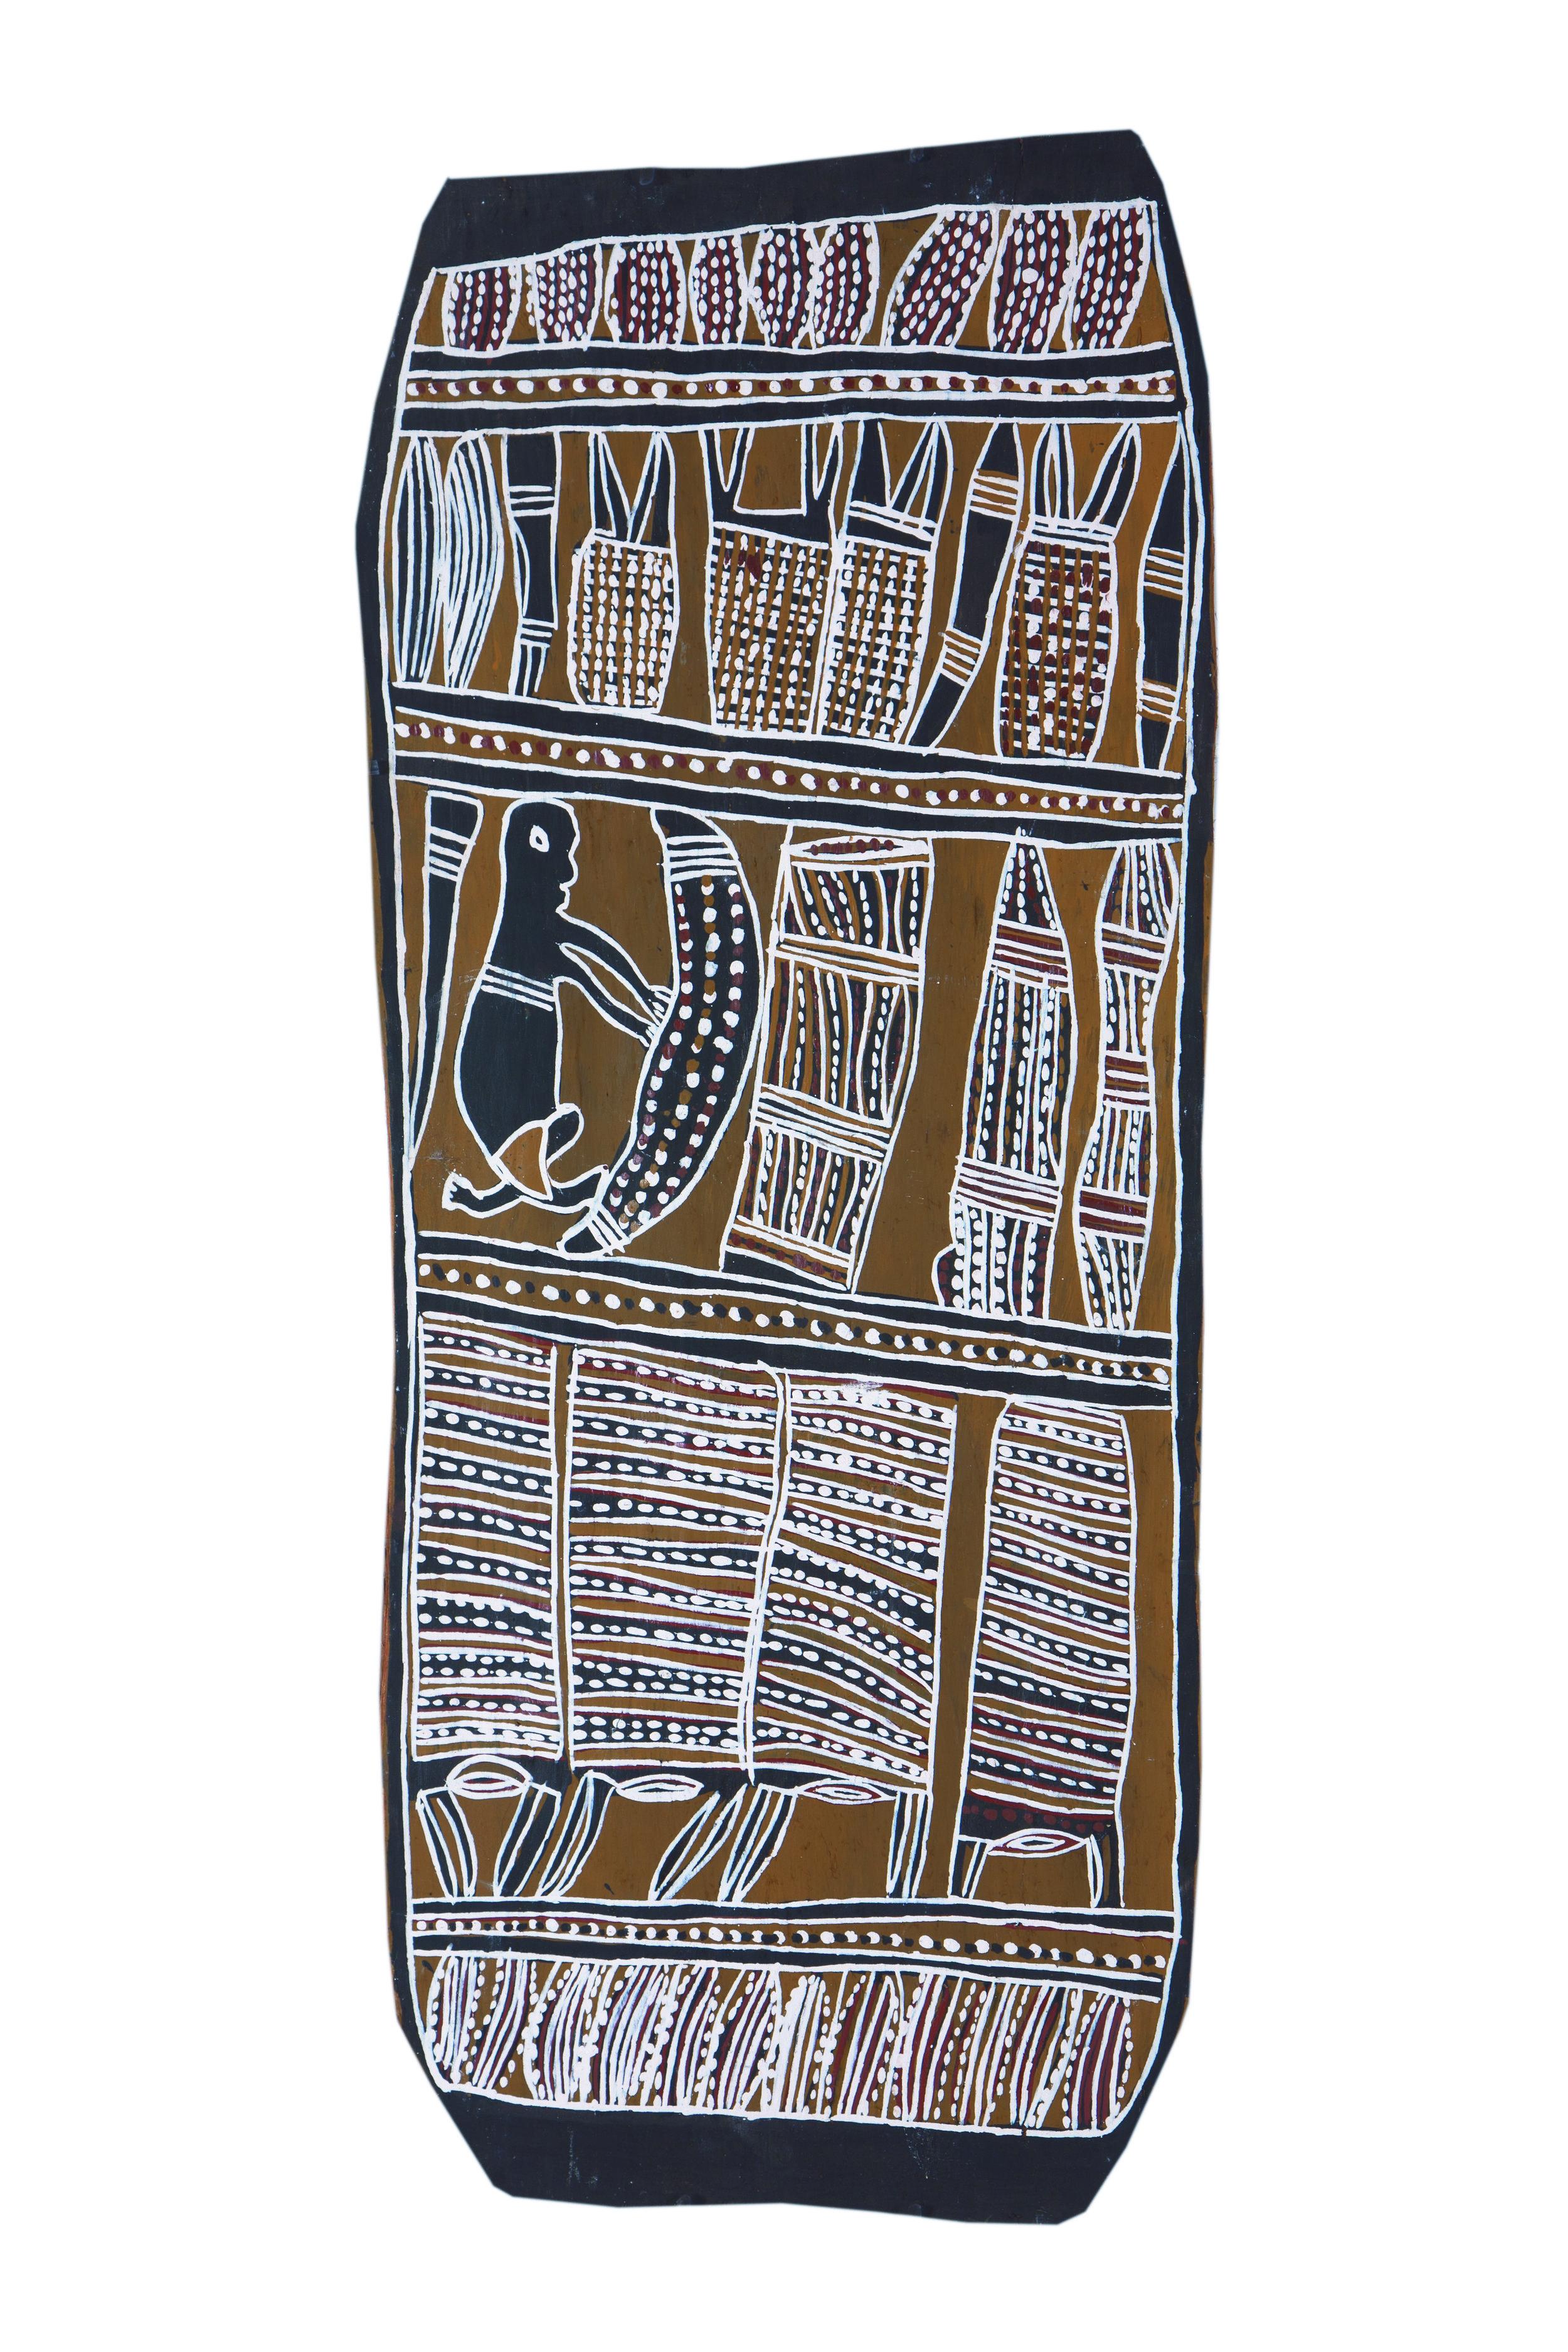 Nonggirrnga Marawili  Hunting  Natural earth pigments on bark 34 x 81cm  Buku Larrnggay Mulka #4026I   EMAIL INQUIRY